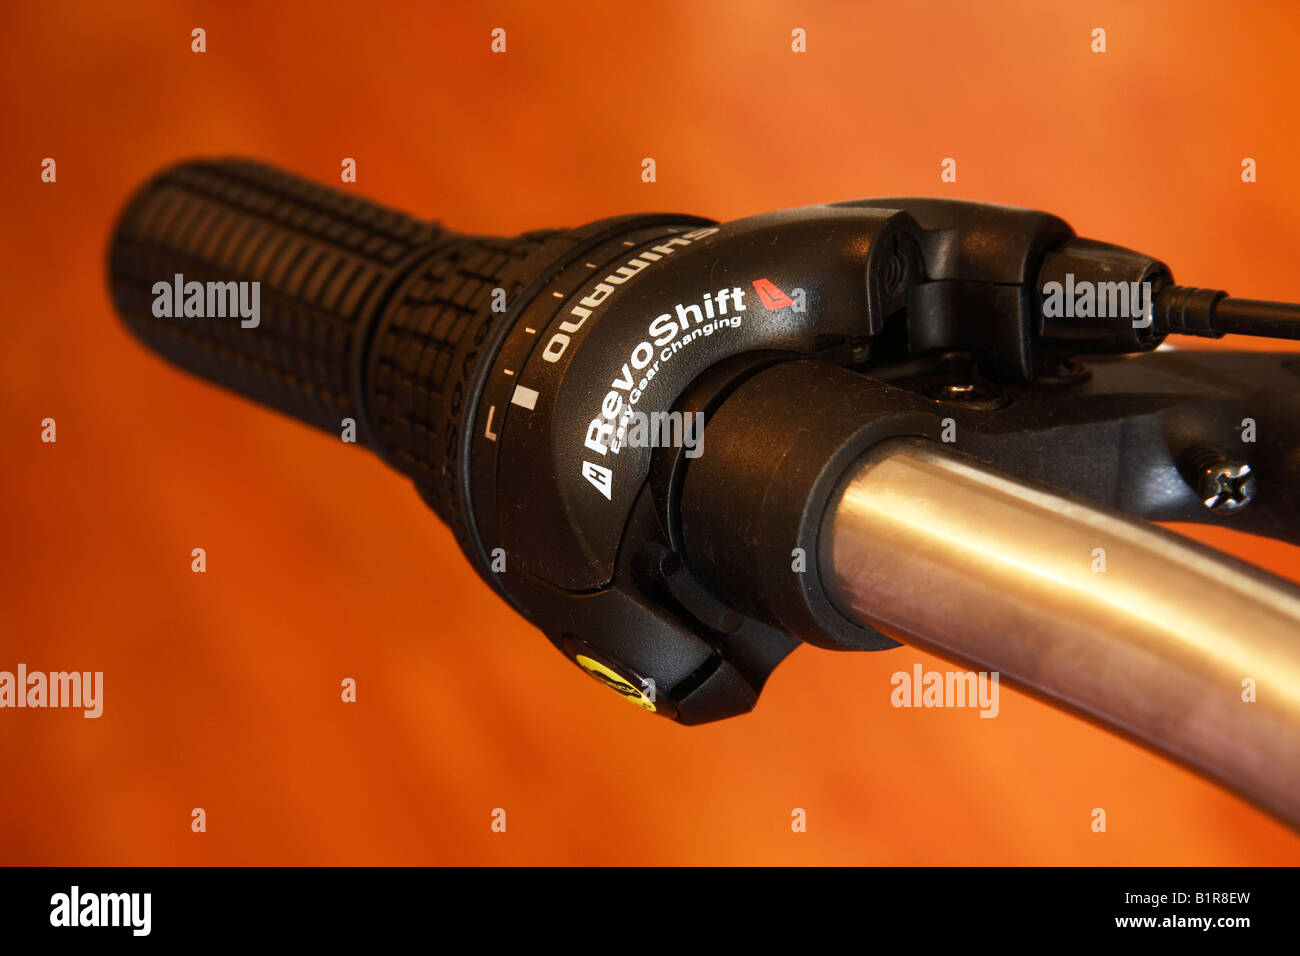 Shimano Geared Bicycle handlebar, close up - Stock Image